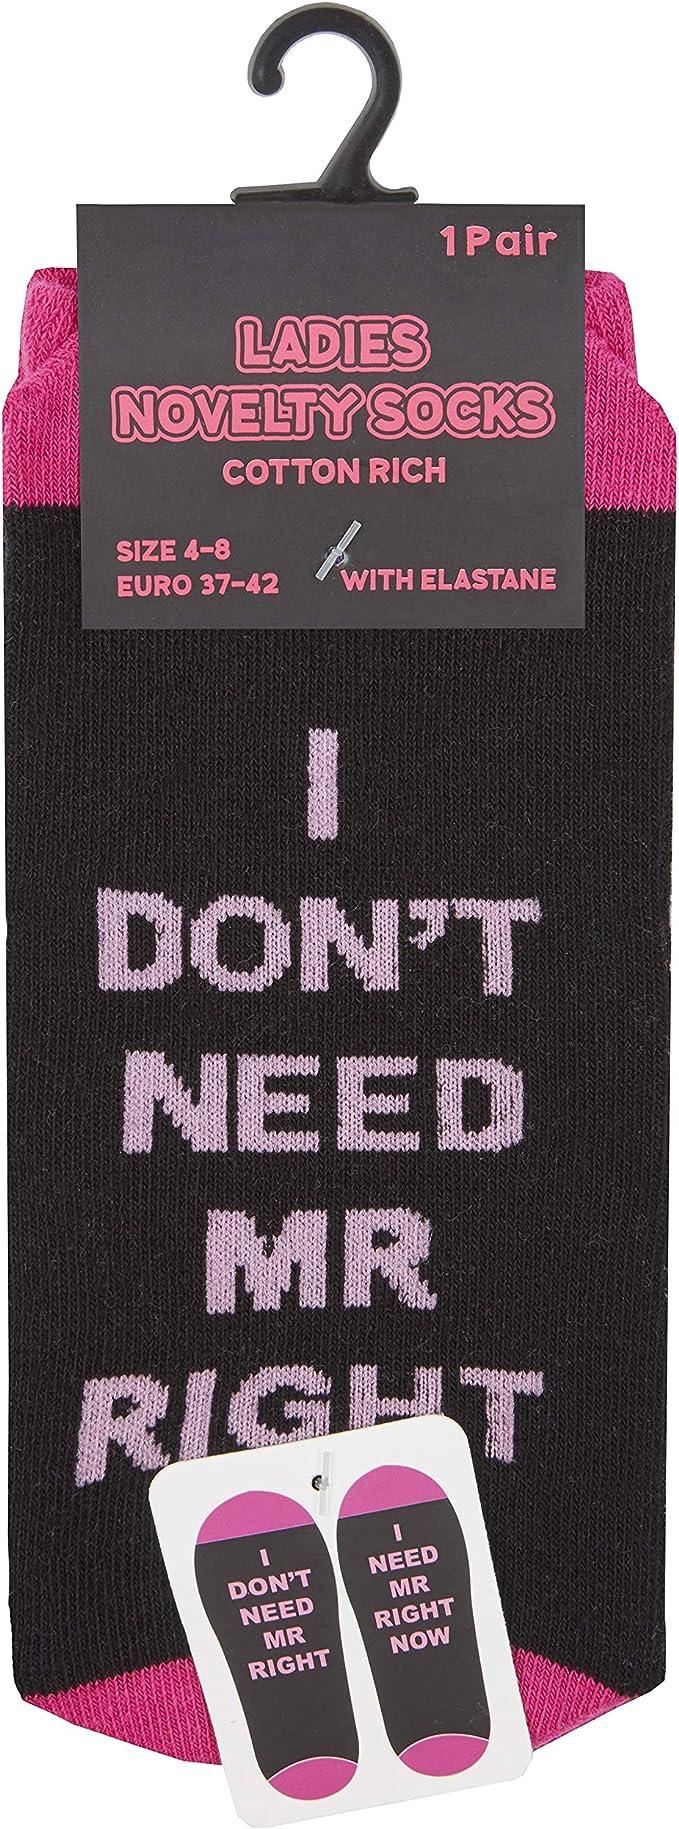 Knitters Pride Karbonz Circular 16-inch 110205 Knitting Needles; Size US 2.50 40cm 3.00mm